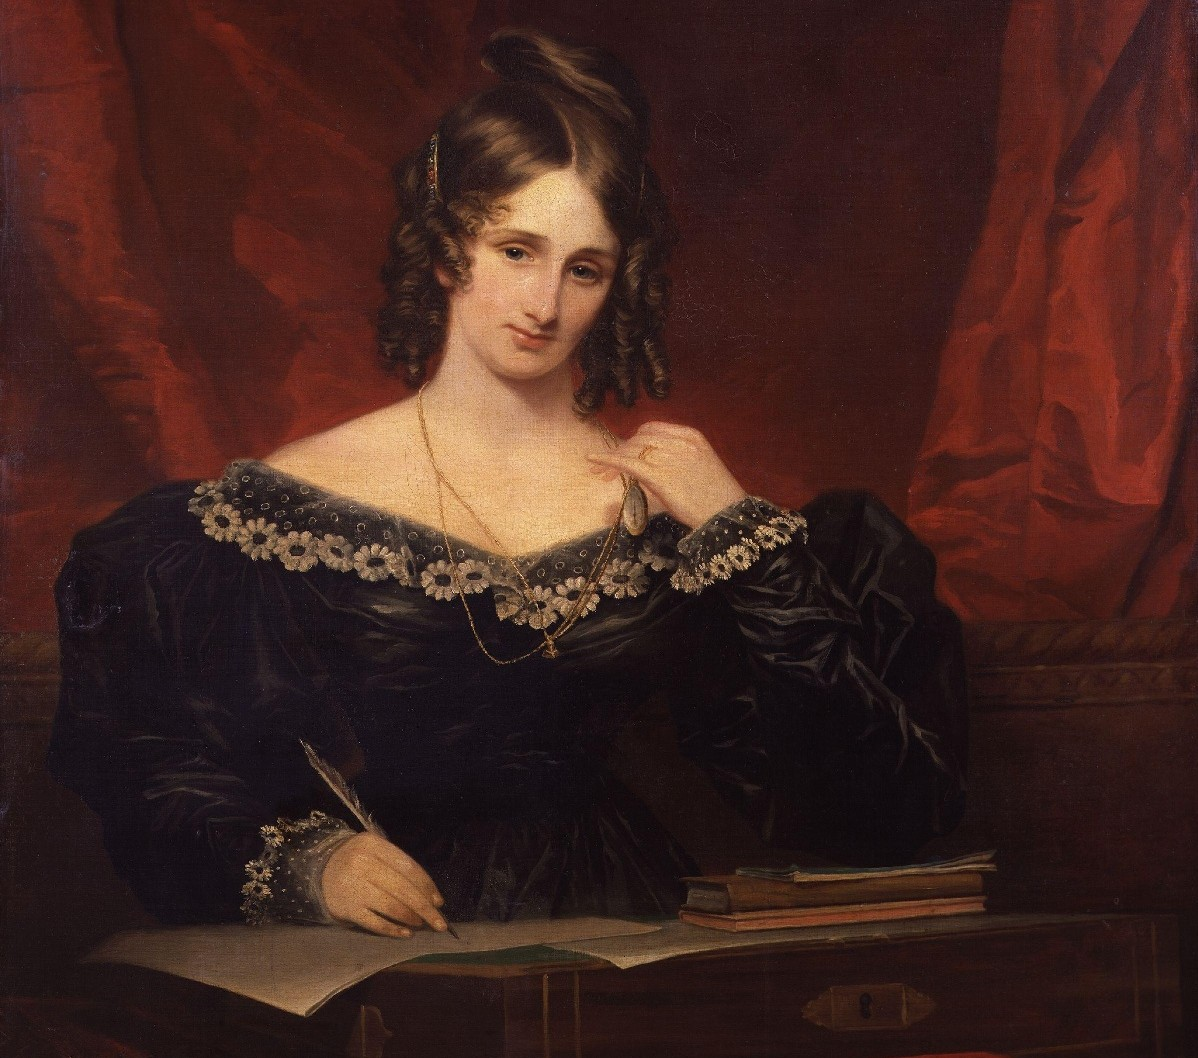 Samuel John Stump: Mary Shelley